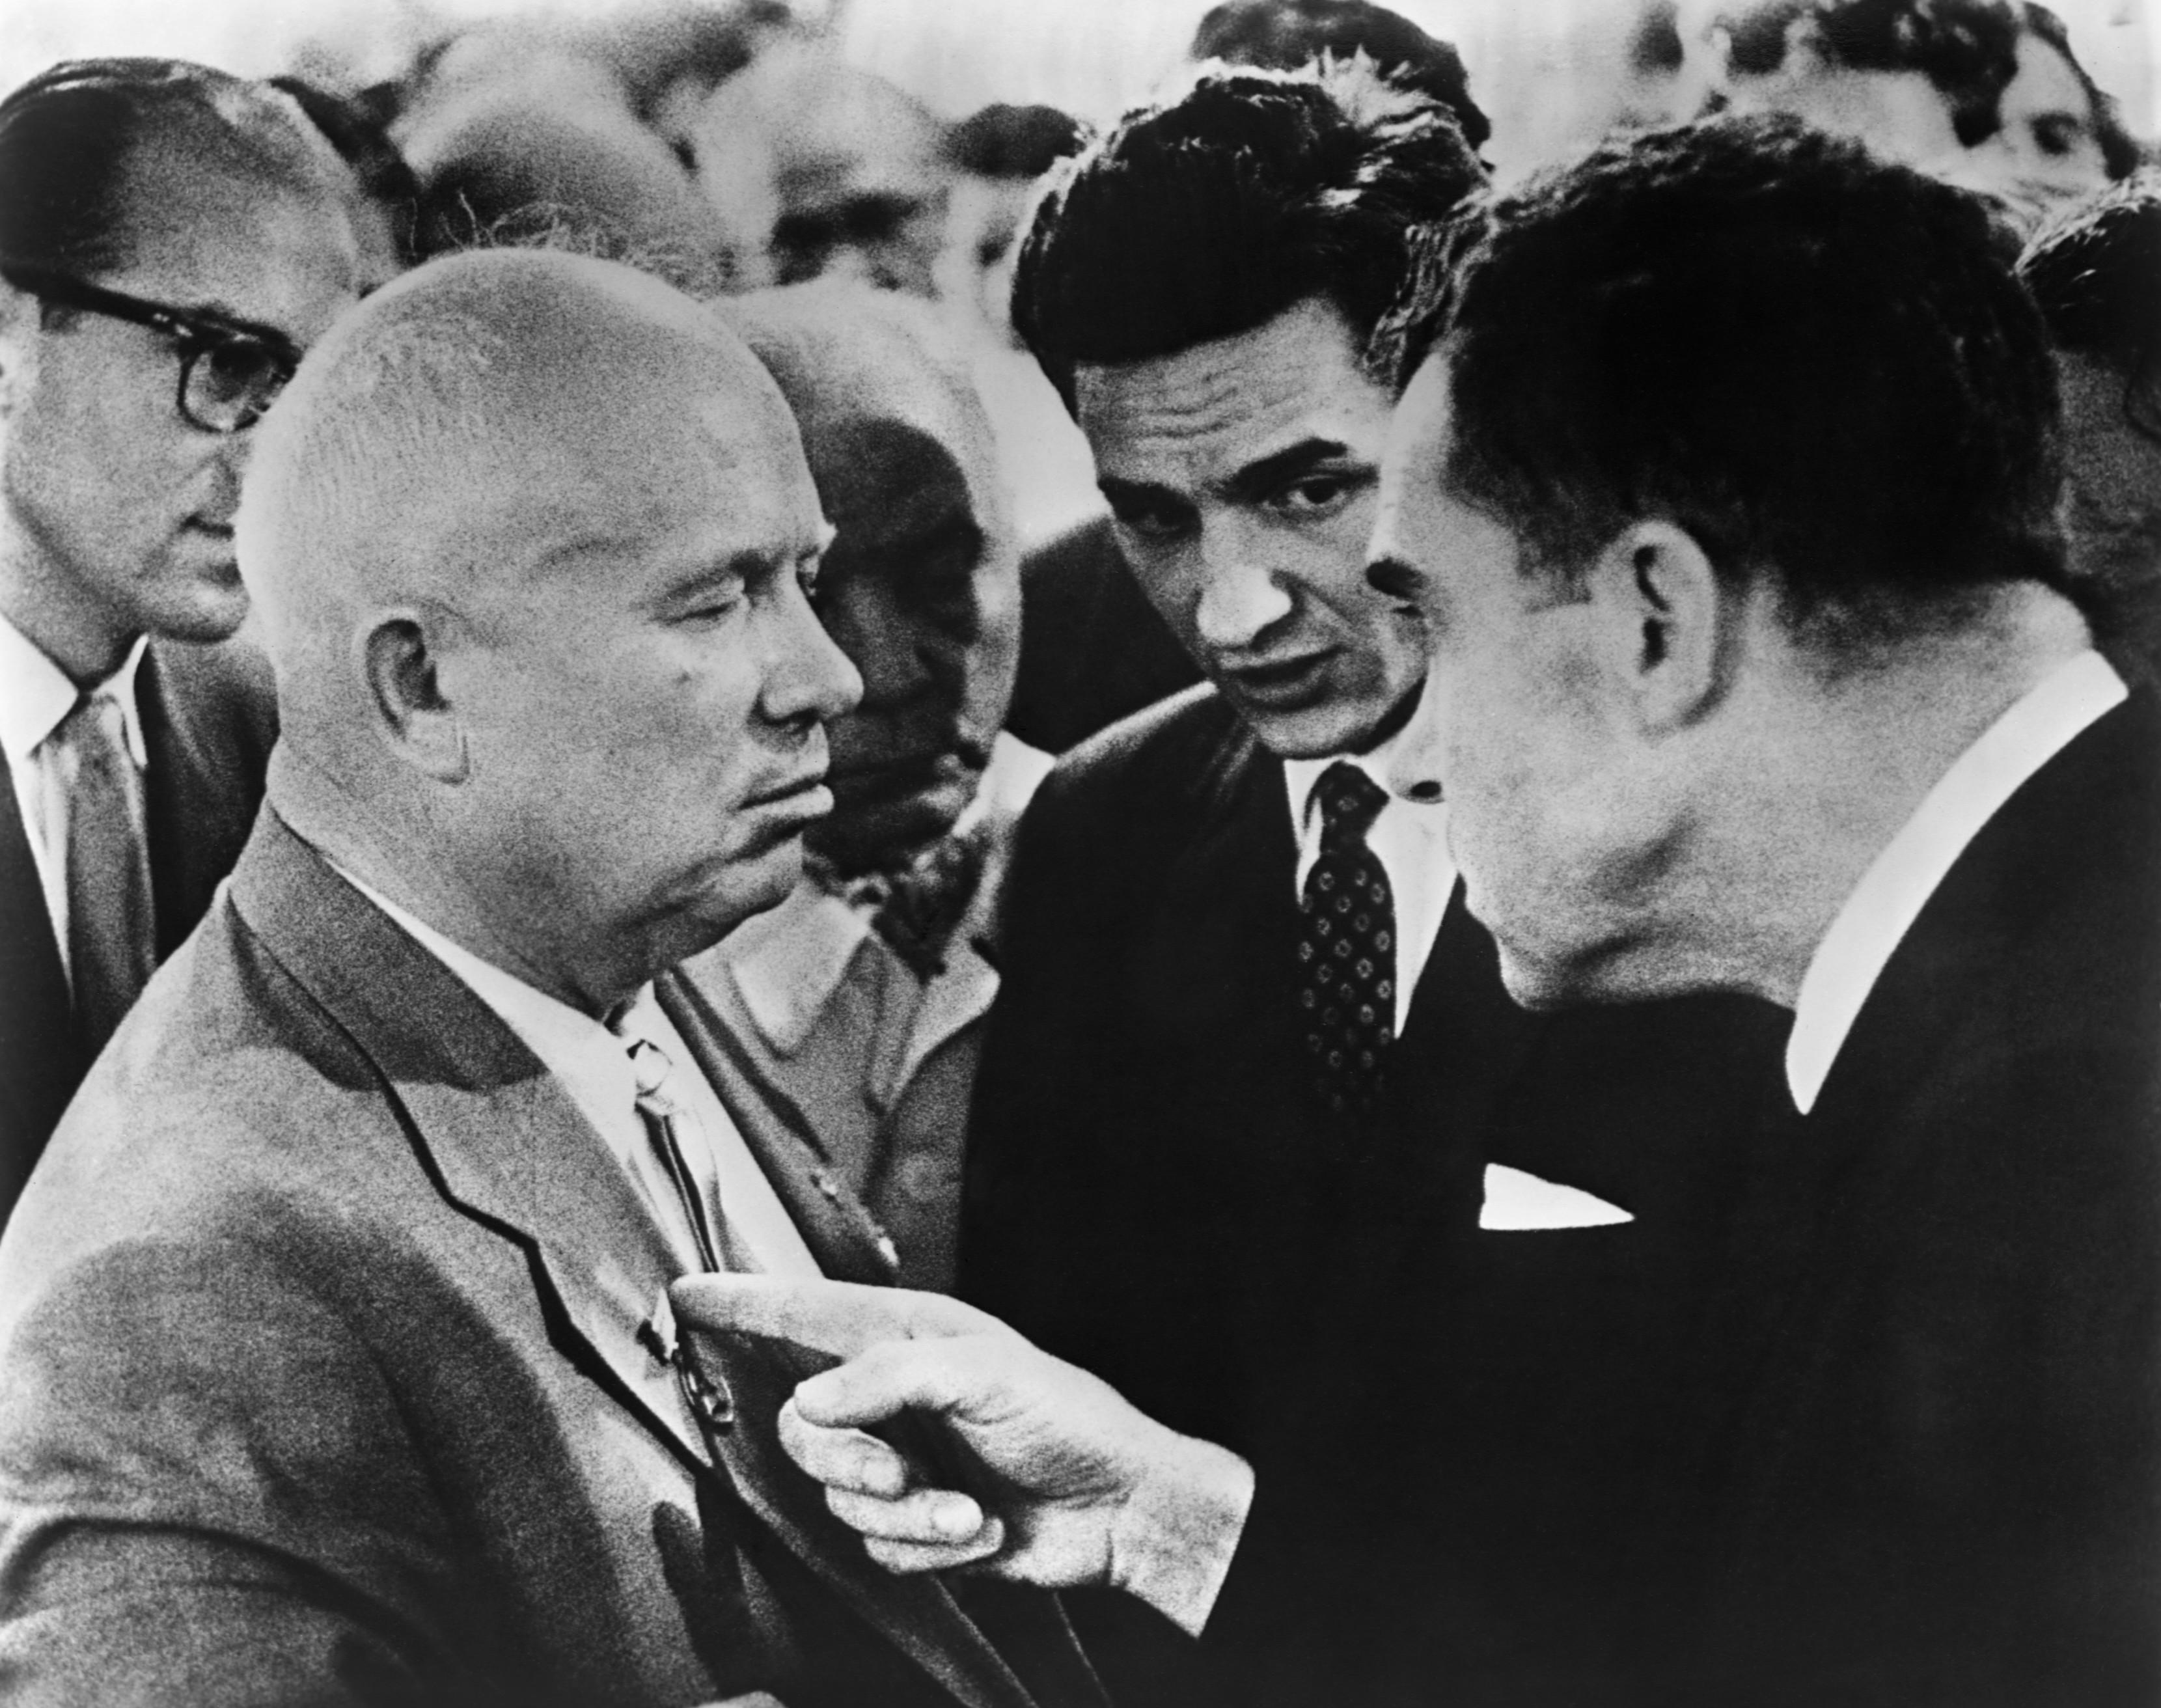 richard-nixon-and-spiro-agnew - Richard Nixon Pictures - Richard M ...